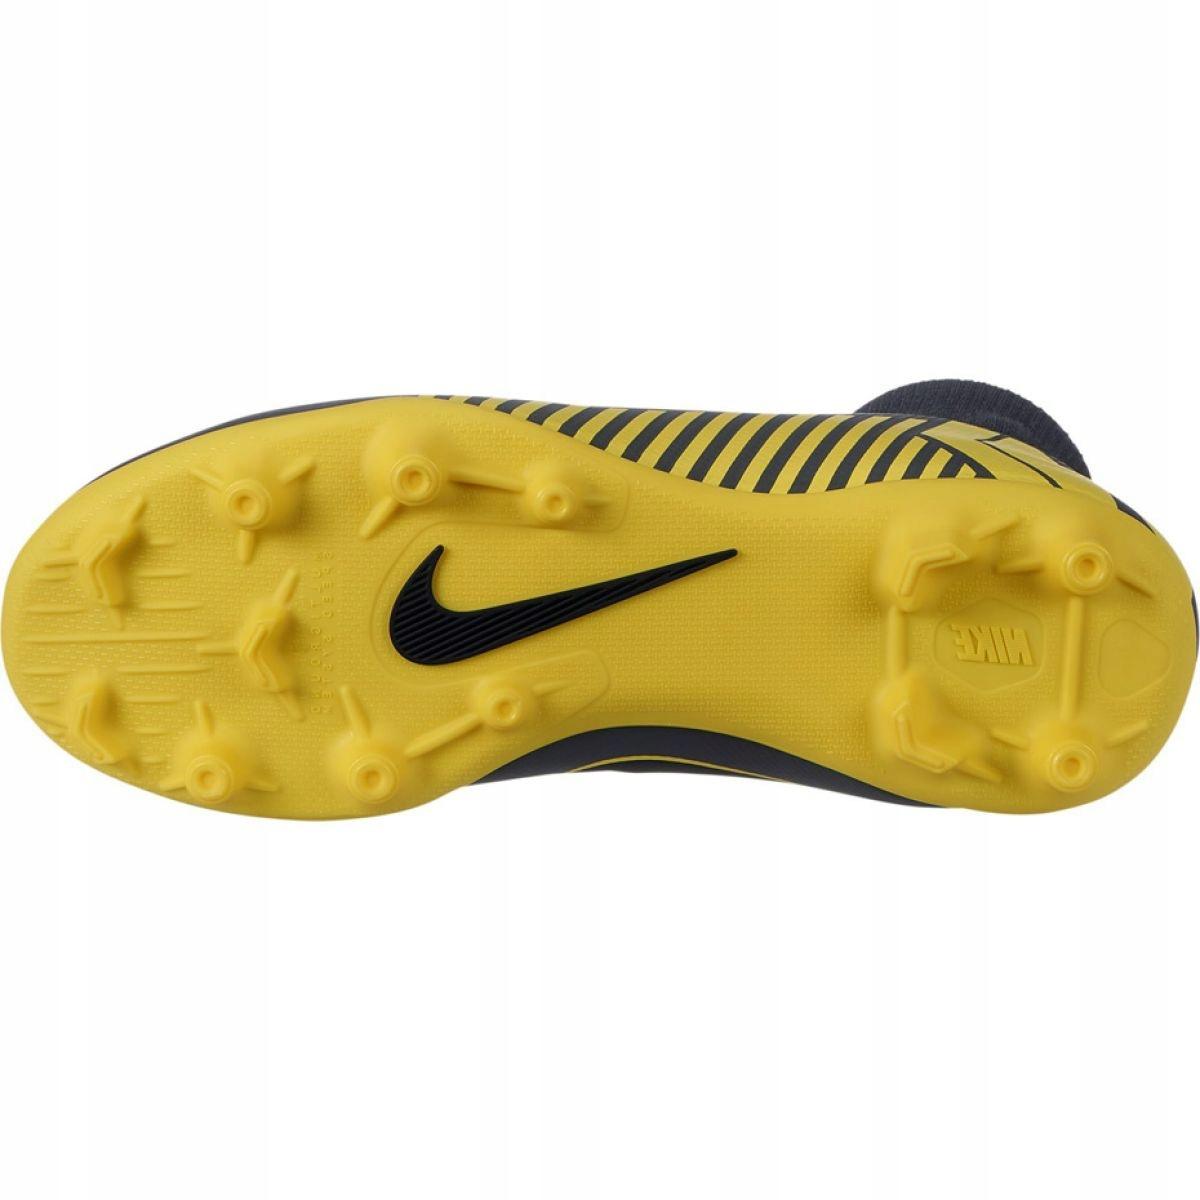 classic fit b8bd2 a2595 Football shoes Nike Mercurial Superfly 6 Club Mg Jr AH7339-070